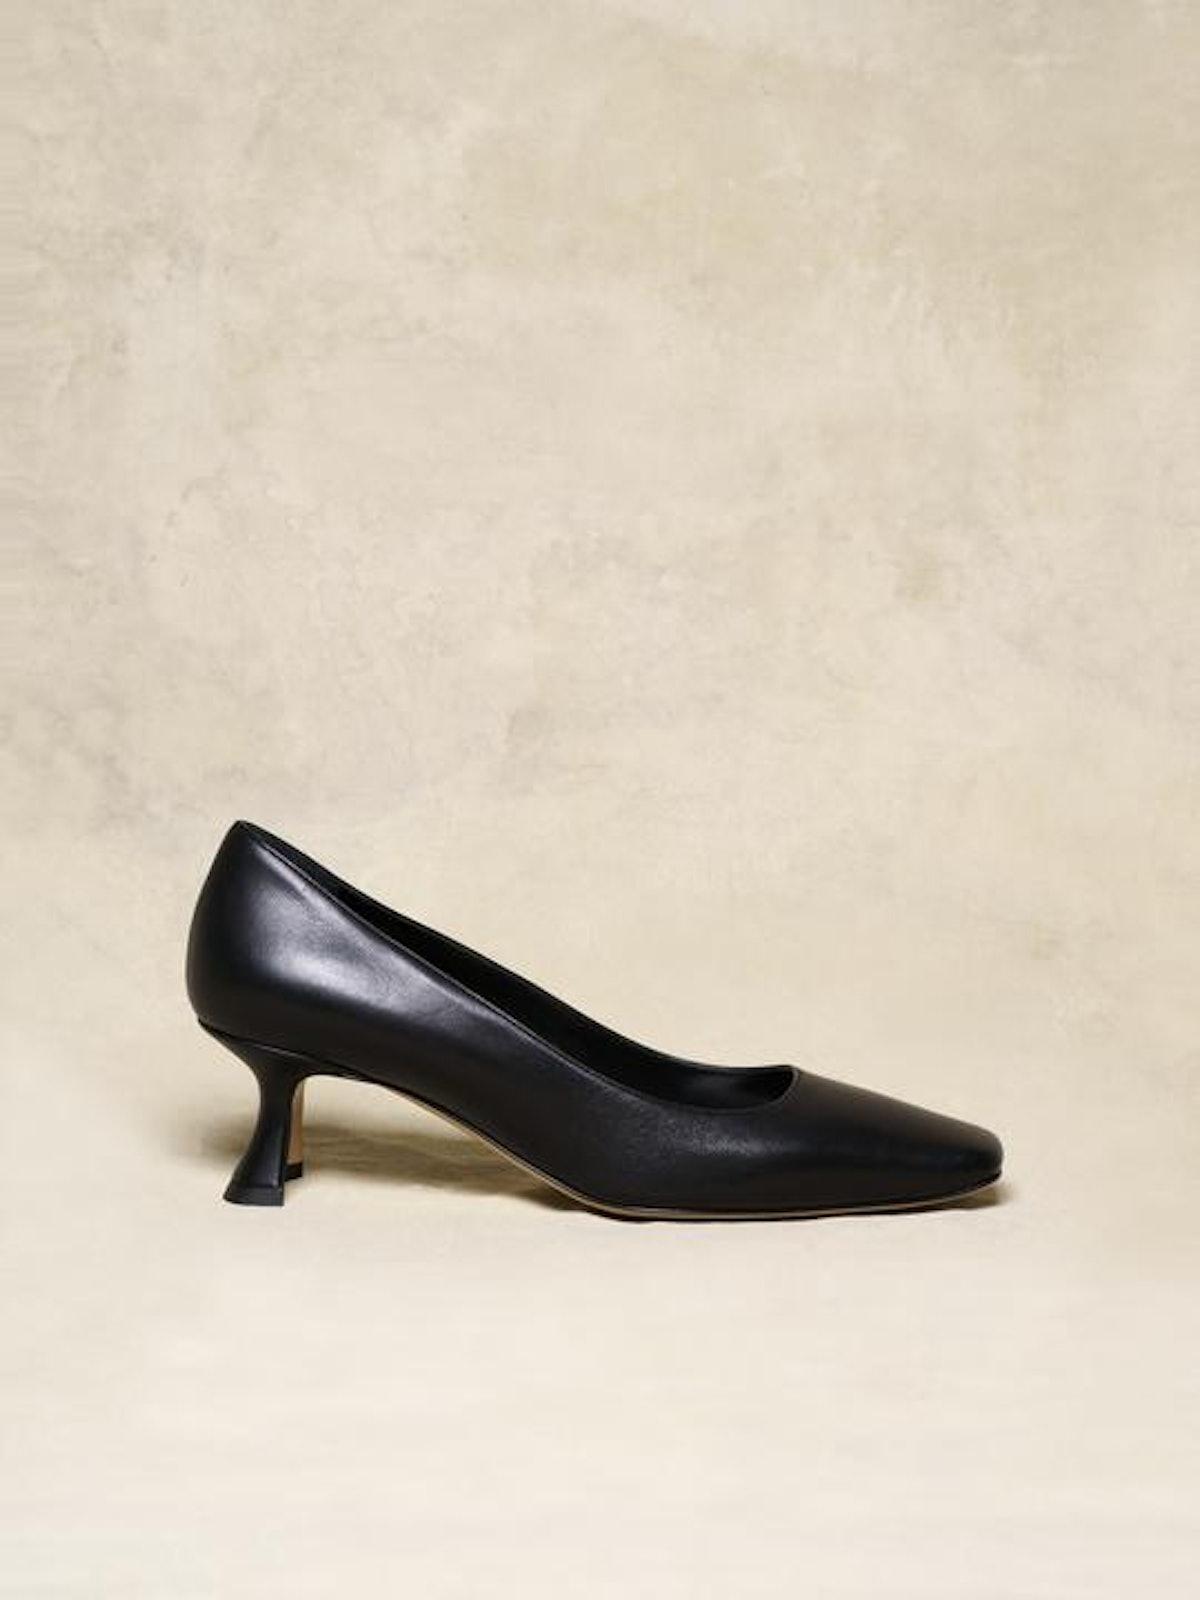 m.gemi heels